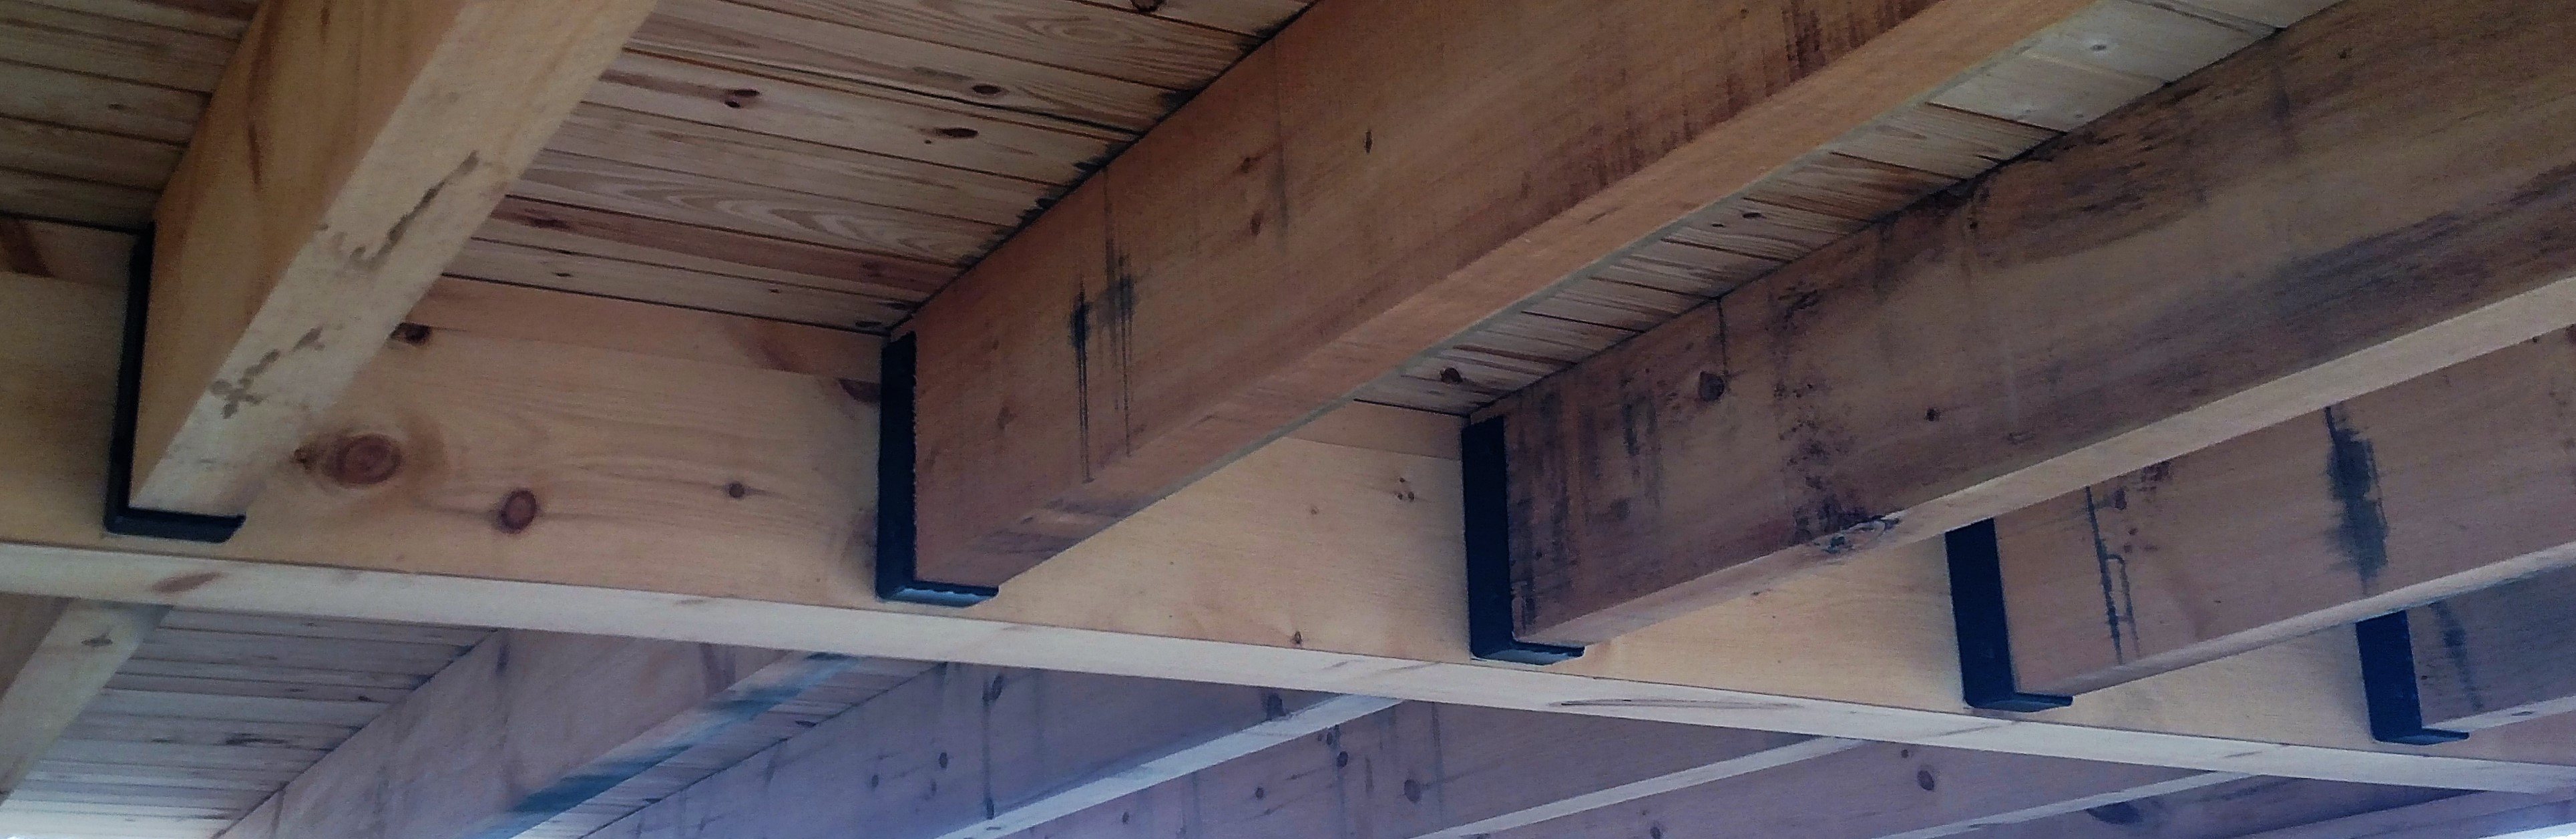 hammered-joist-hanger-w-inside-flange-2.jpg